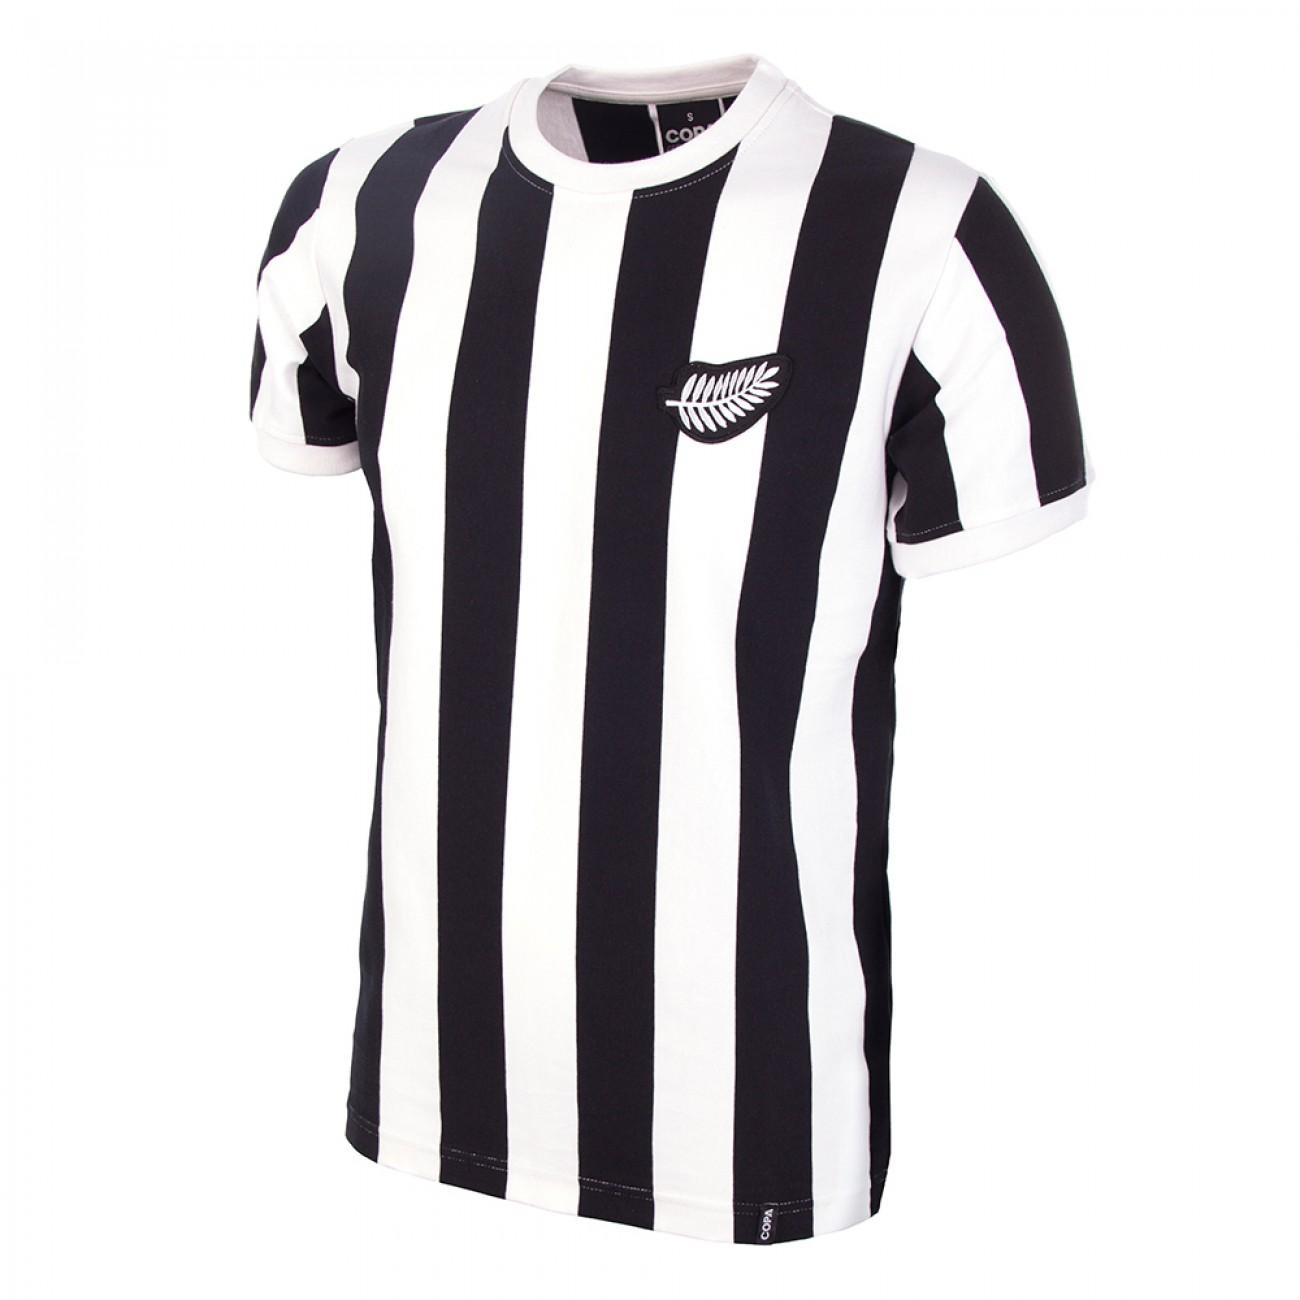 http://www.retrofootball.es/ropa-de-futbol/camiseta-nueva-zelanda-1969.html